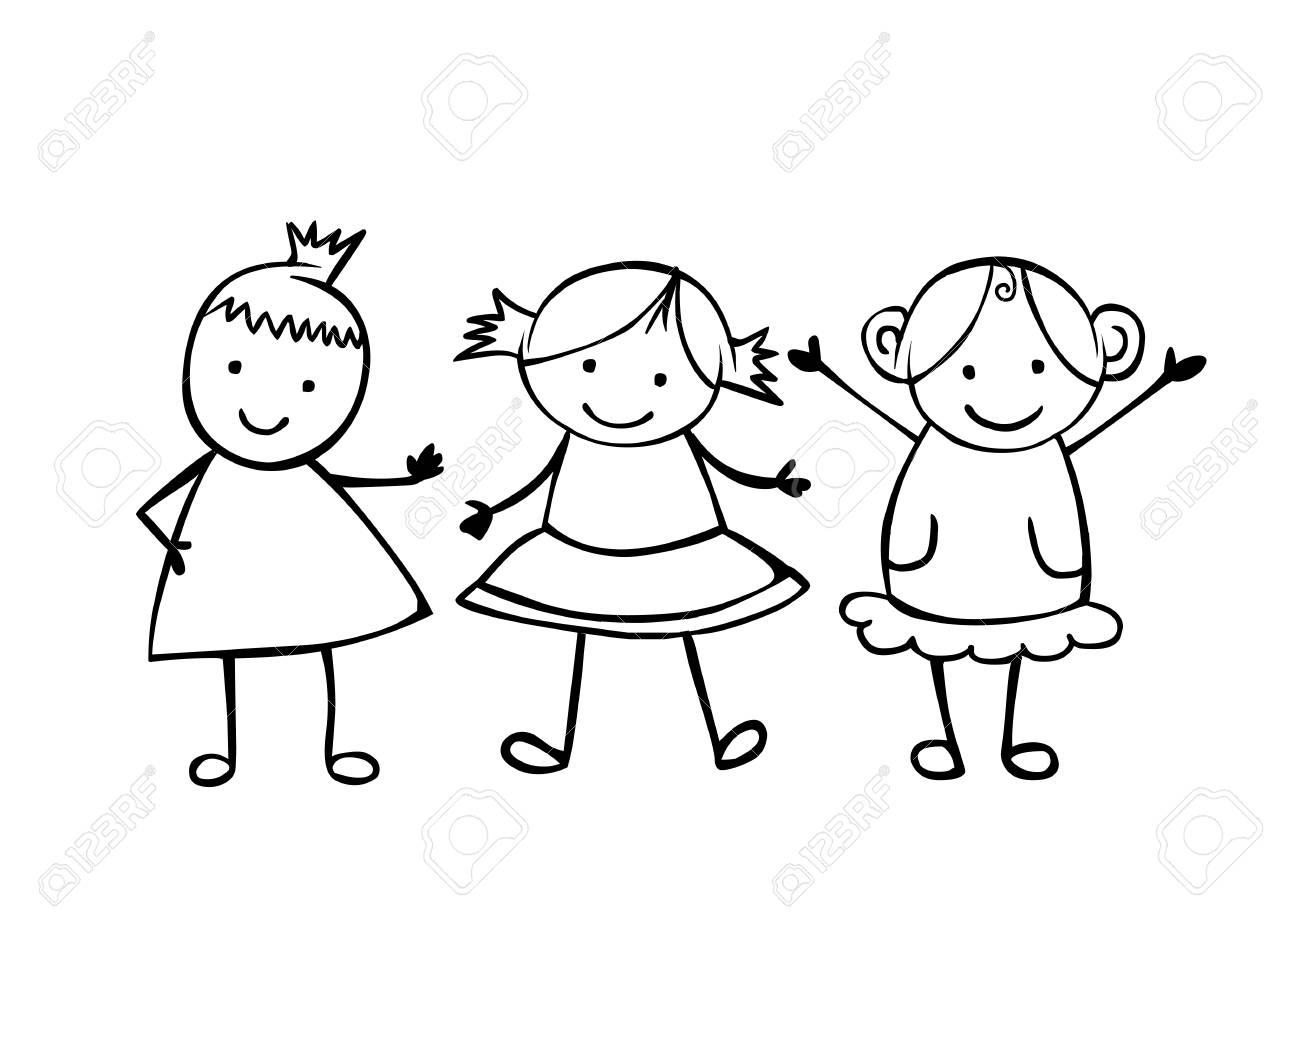 Friends in 3 girls. Little linear people in the children's style.